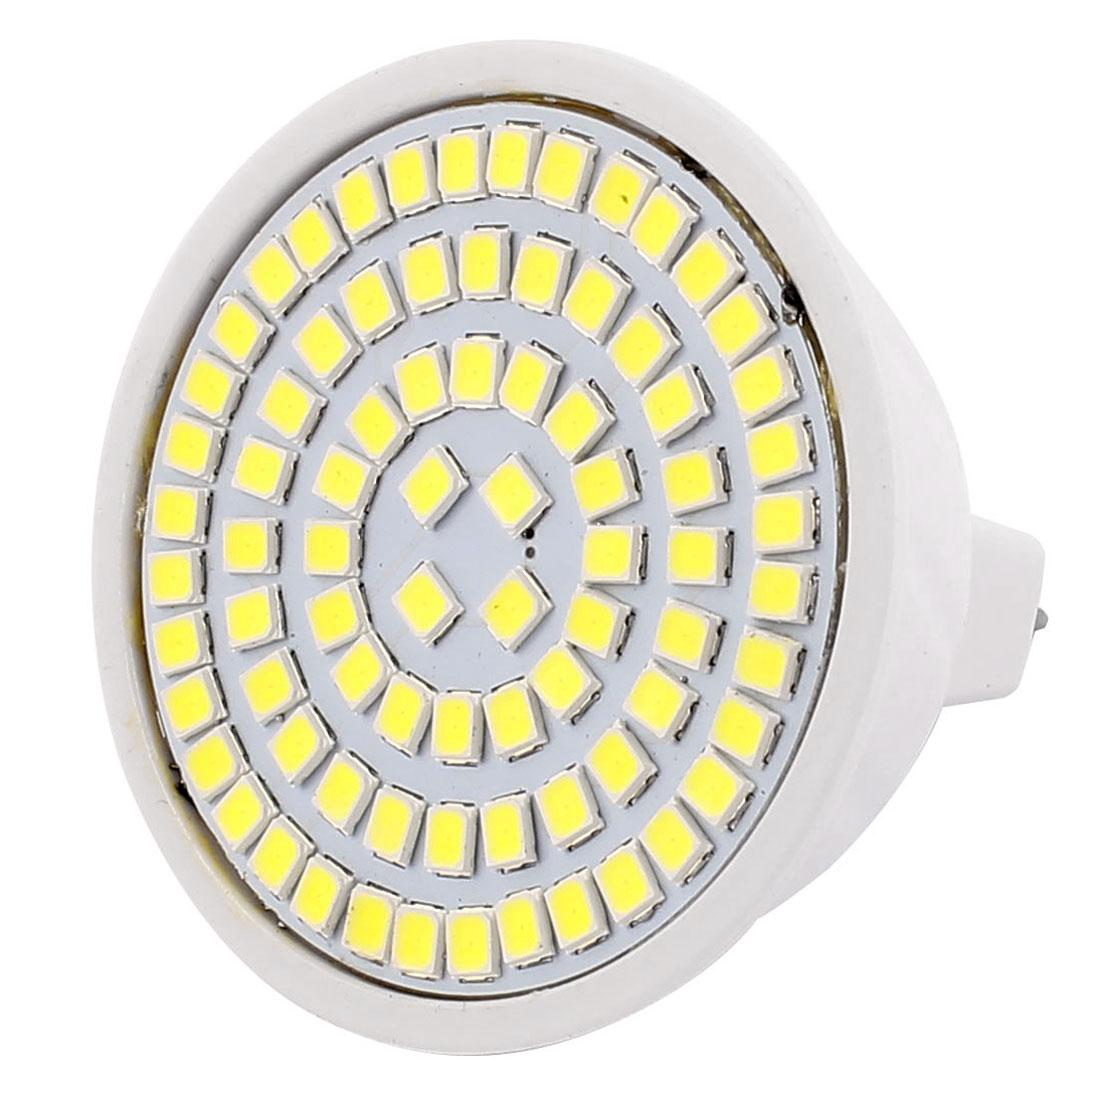 MR16 SMD 2835 80 LEDs Plastic Energy-Saving LED Lamp Bulb White AC 220V 8W